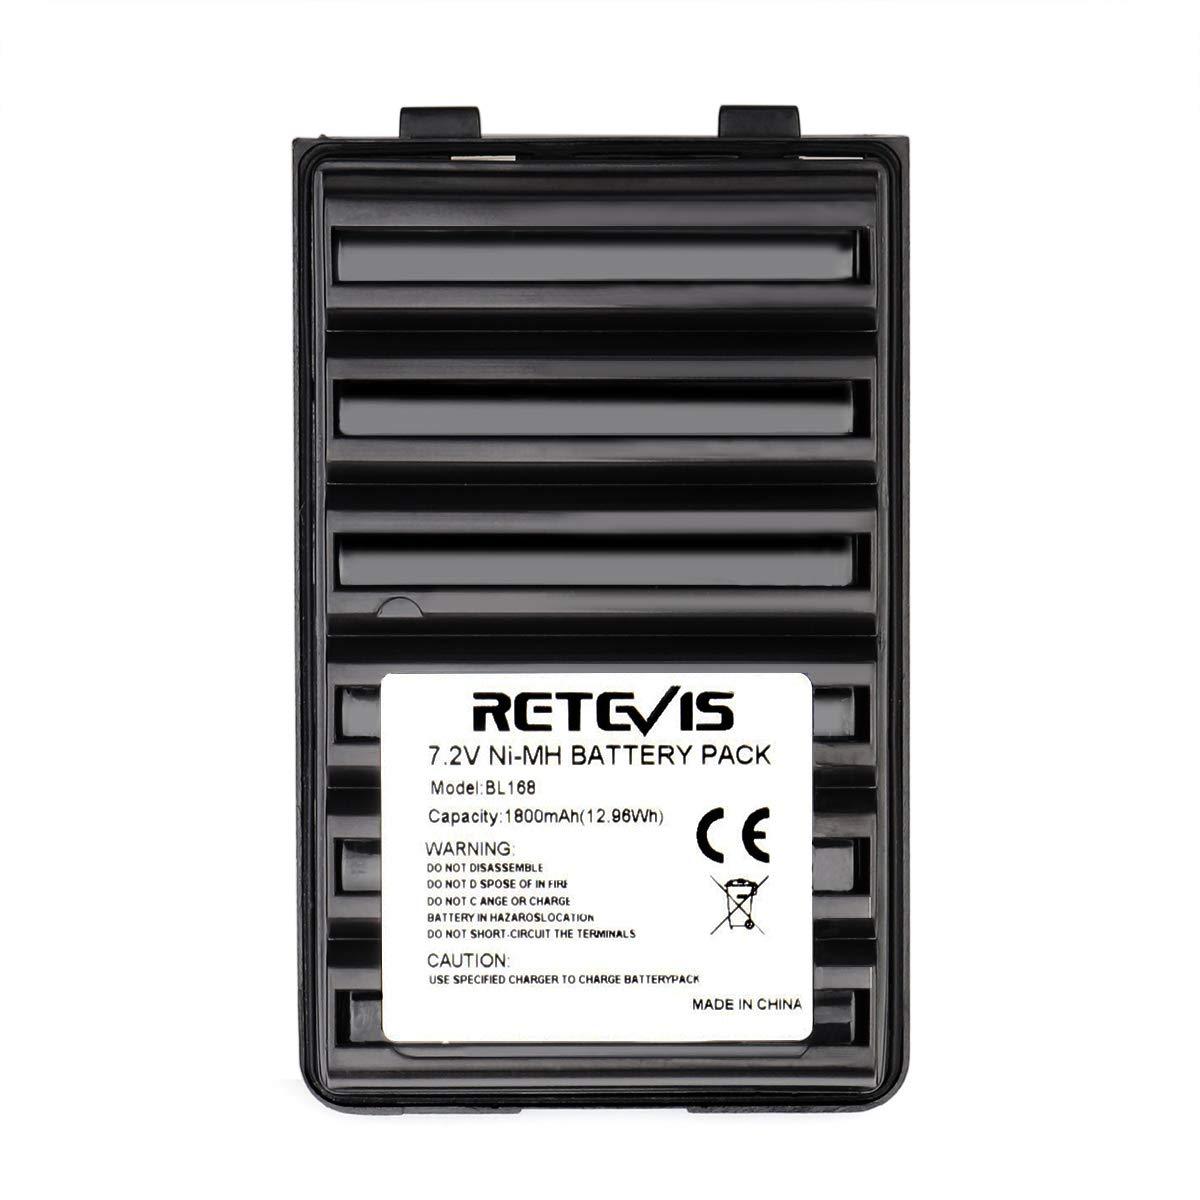 Retevis BL168 Two Way Radio Battery 7.2V 1800mAh Ni-MH Rechargeable Battery for Yaesu FT-60R VX-170 Vertex VX-150 VX-160 Walkie Talkies 1 Pack